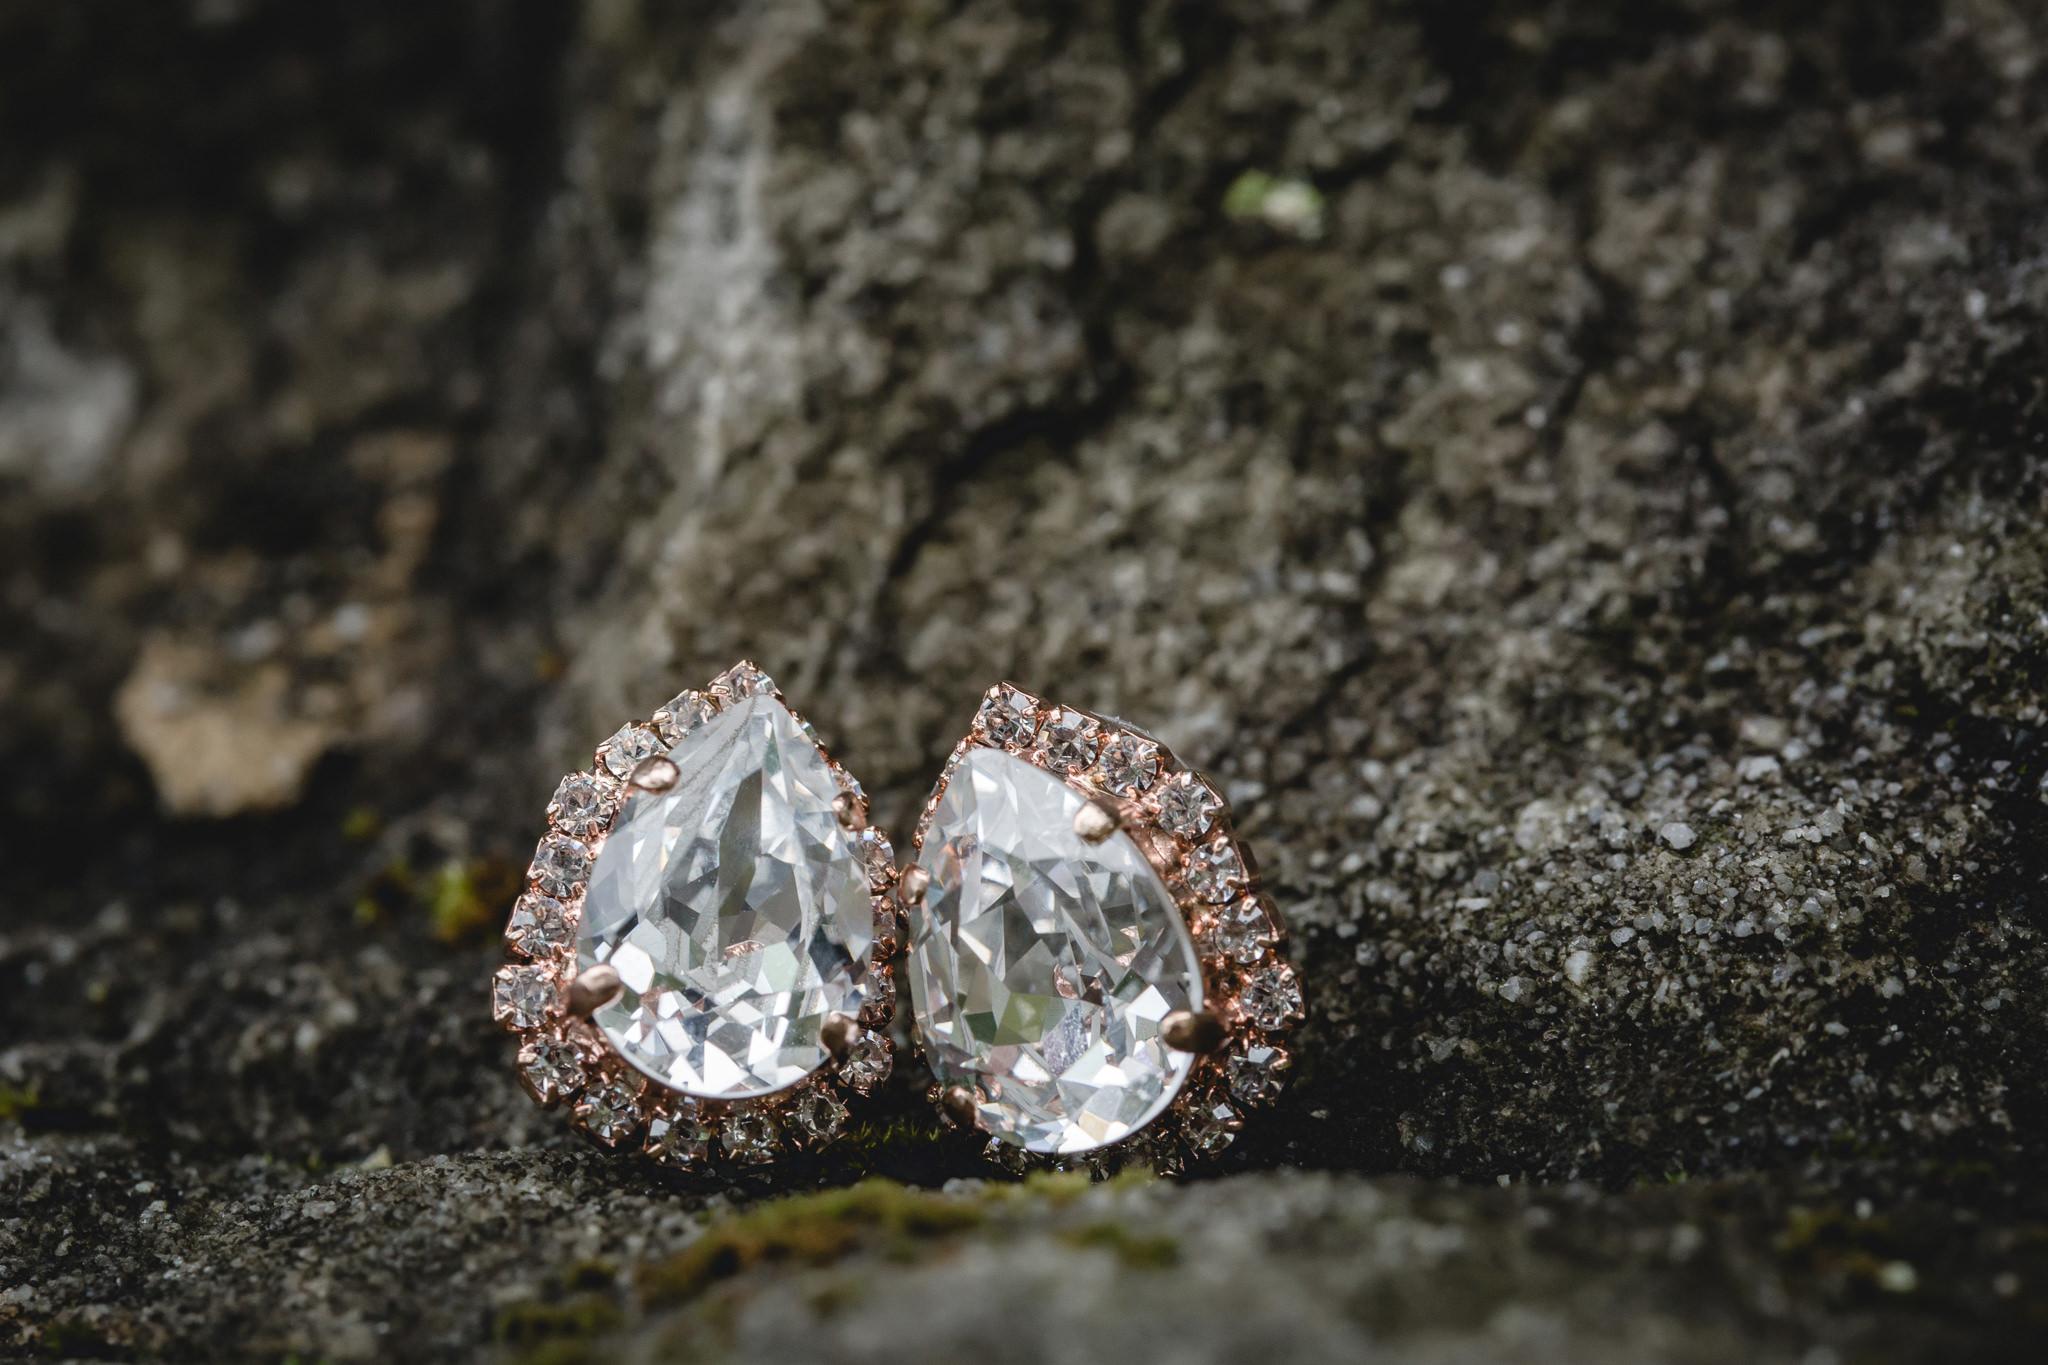 Pear-shaped diamond earrings on a rock at Hidden Valley Resort